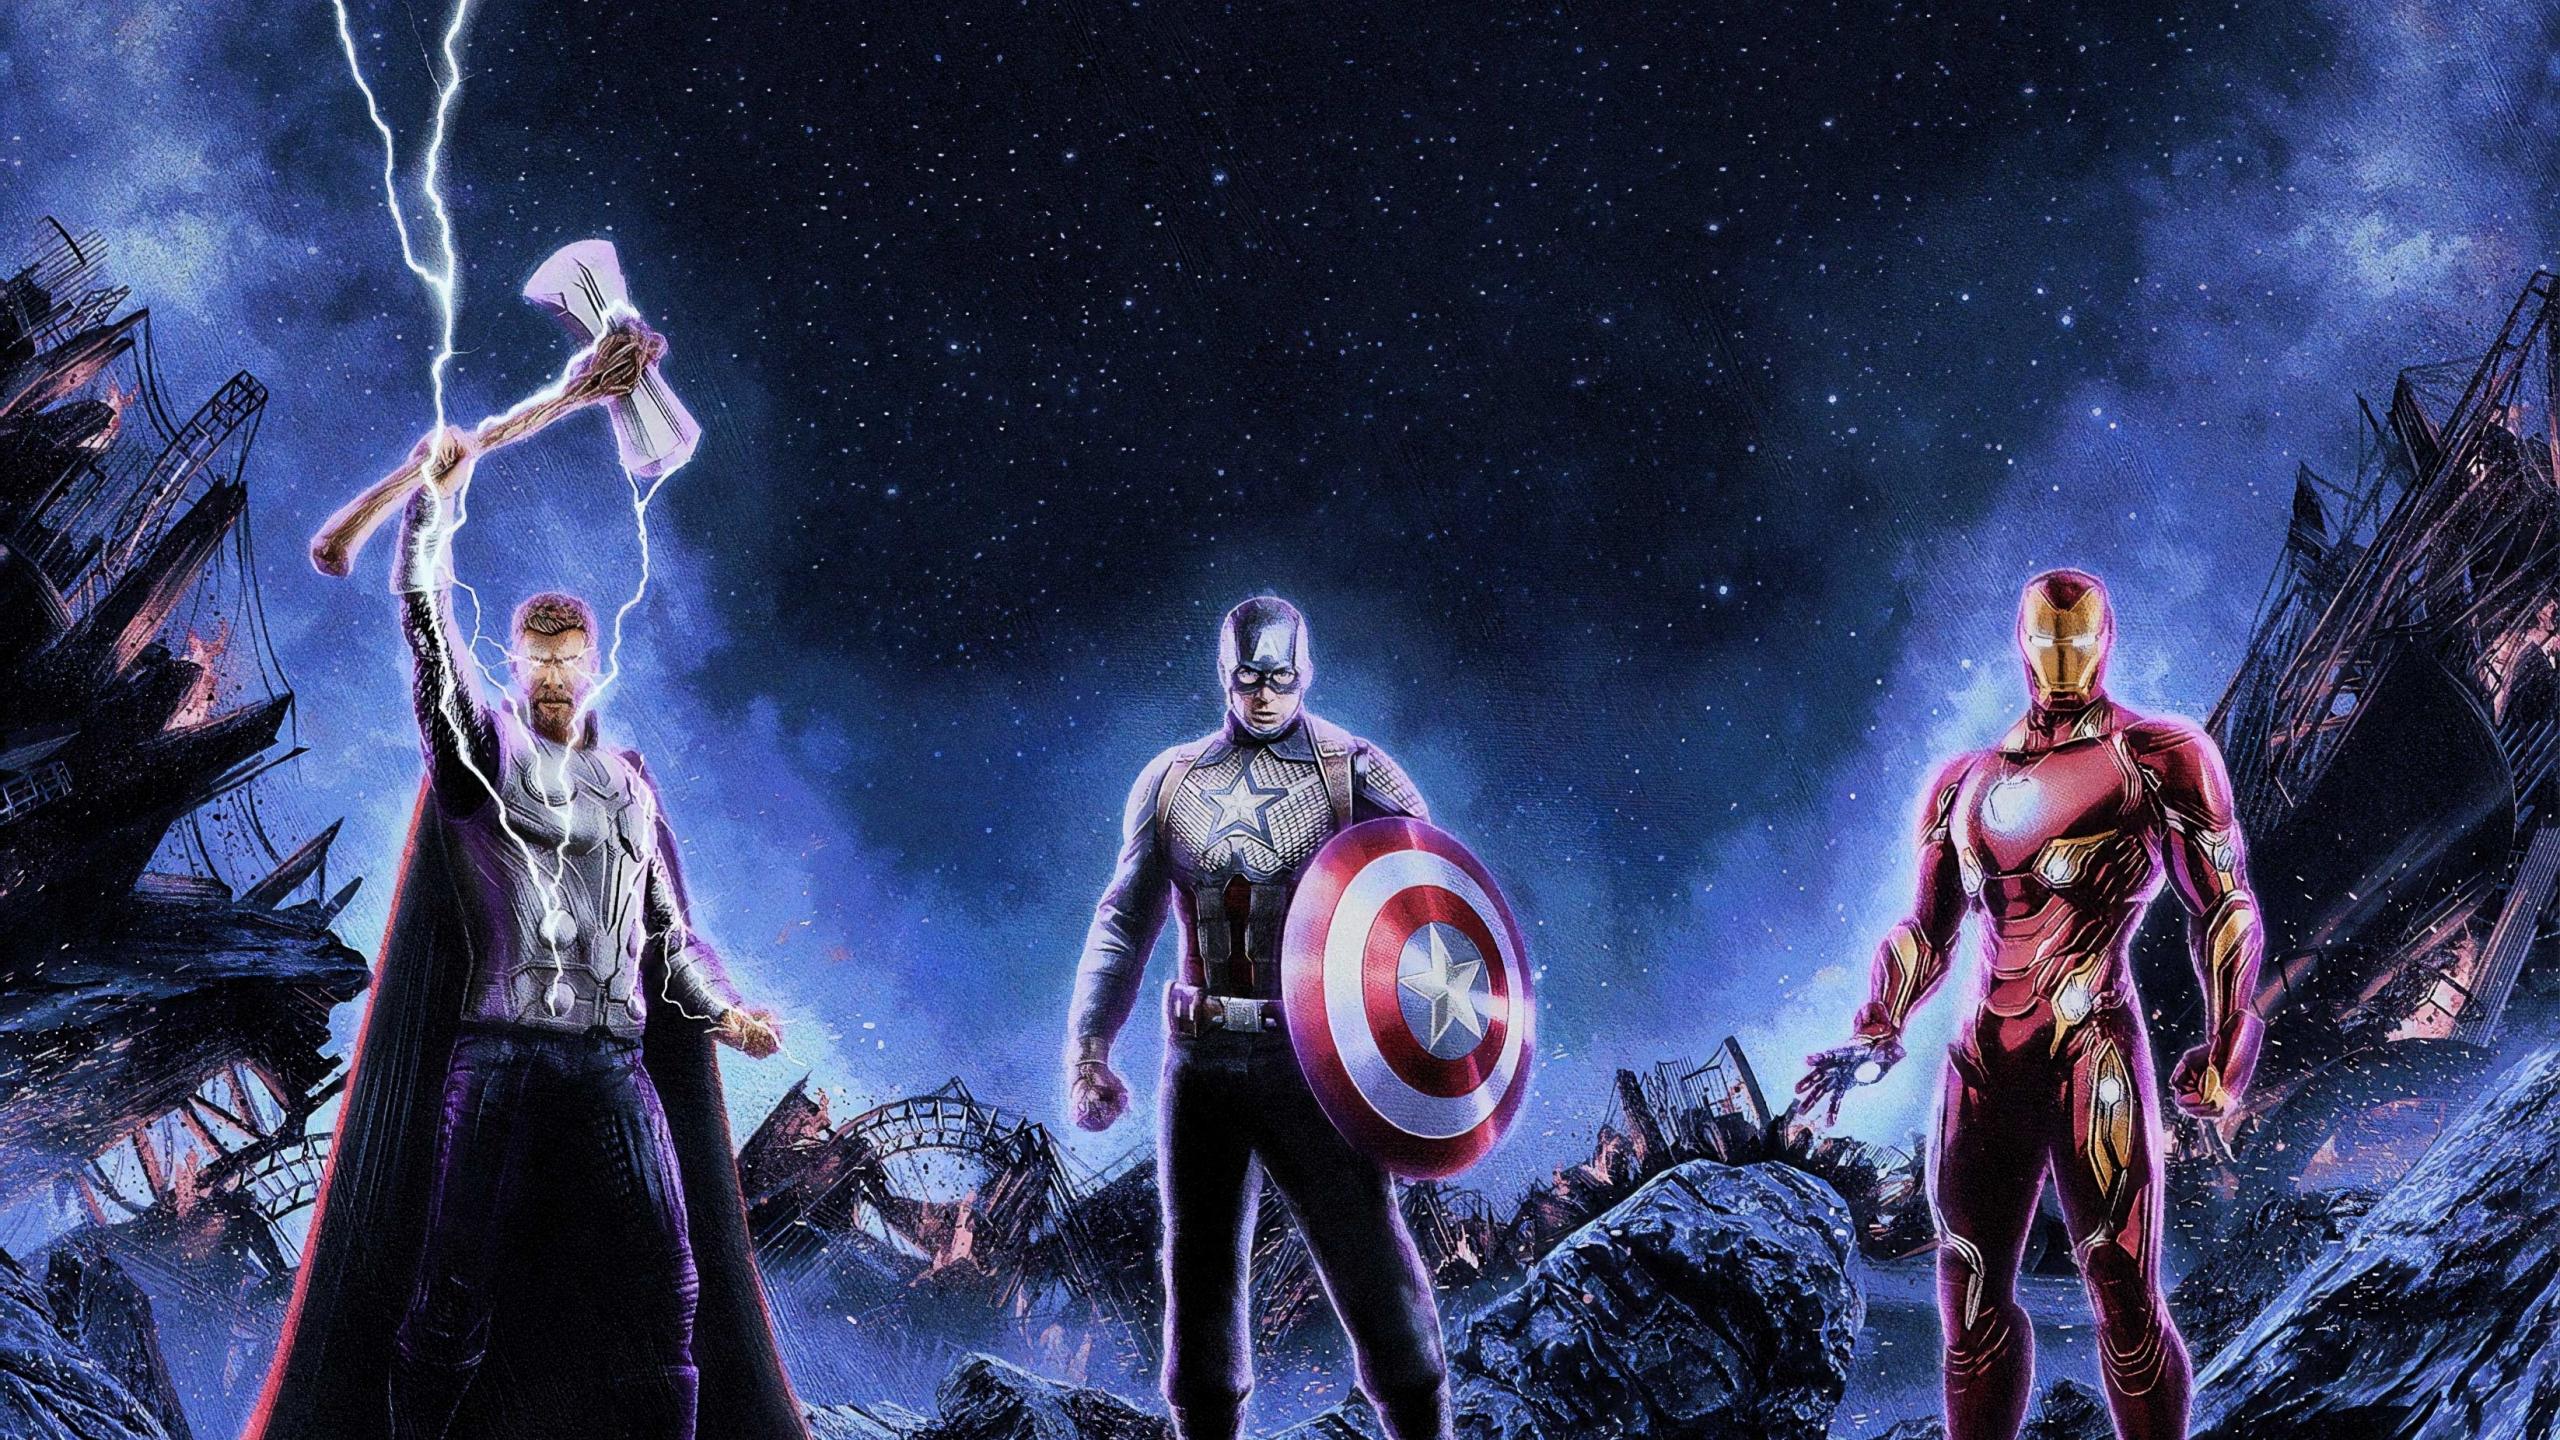 2560x1440 The Trinity Avengers Endgame 1440P Resolution ...